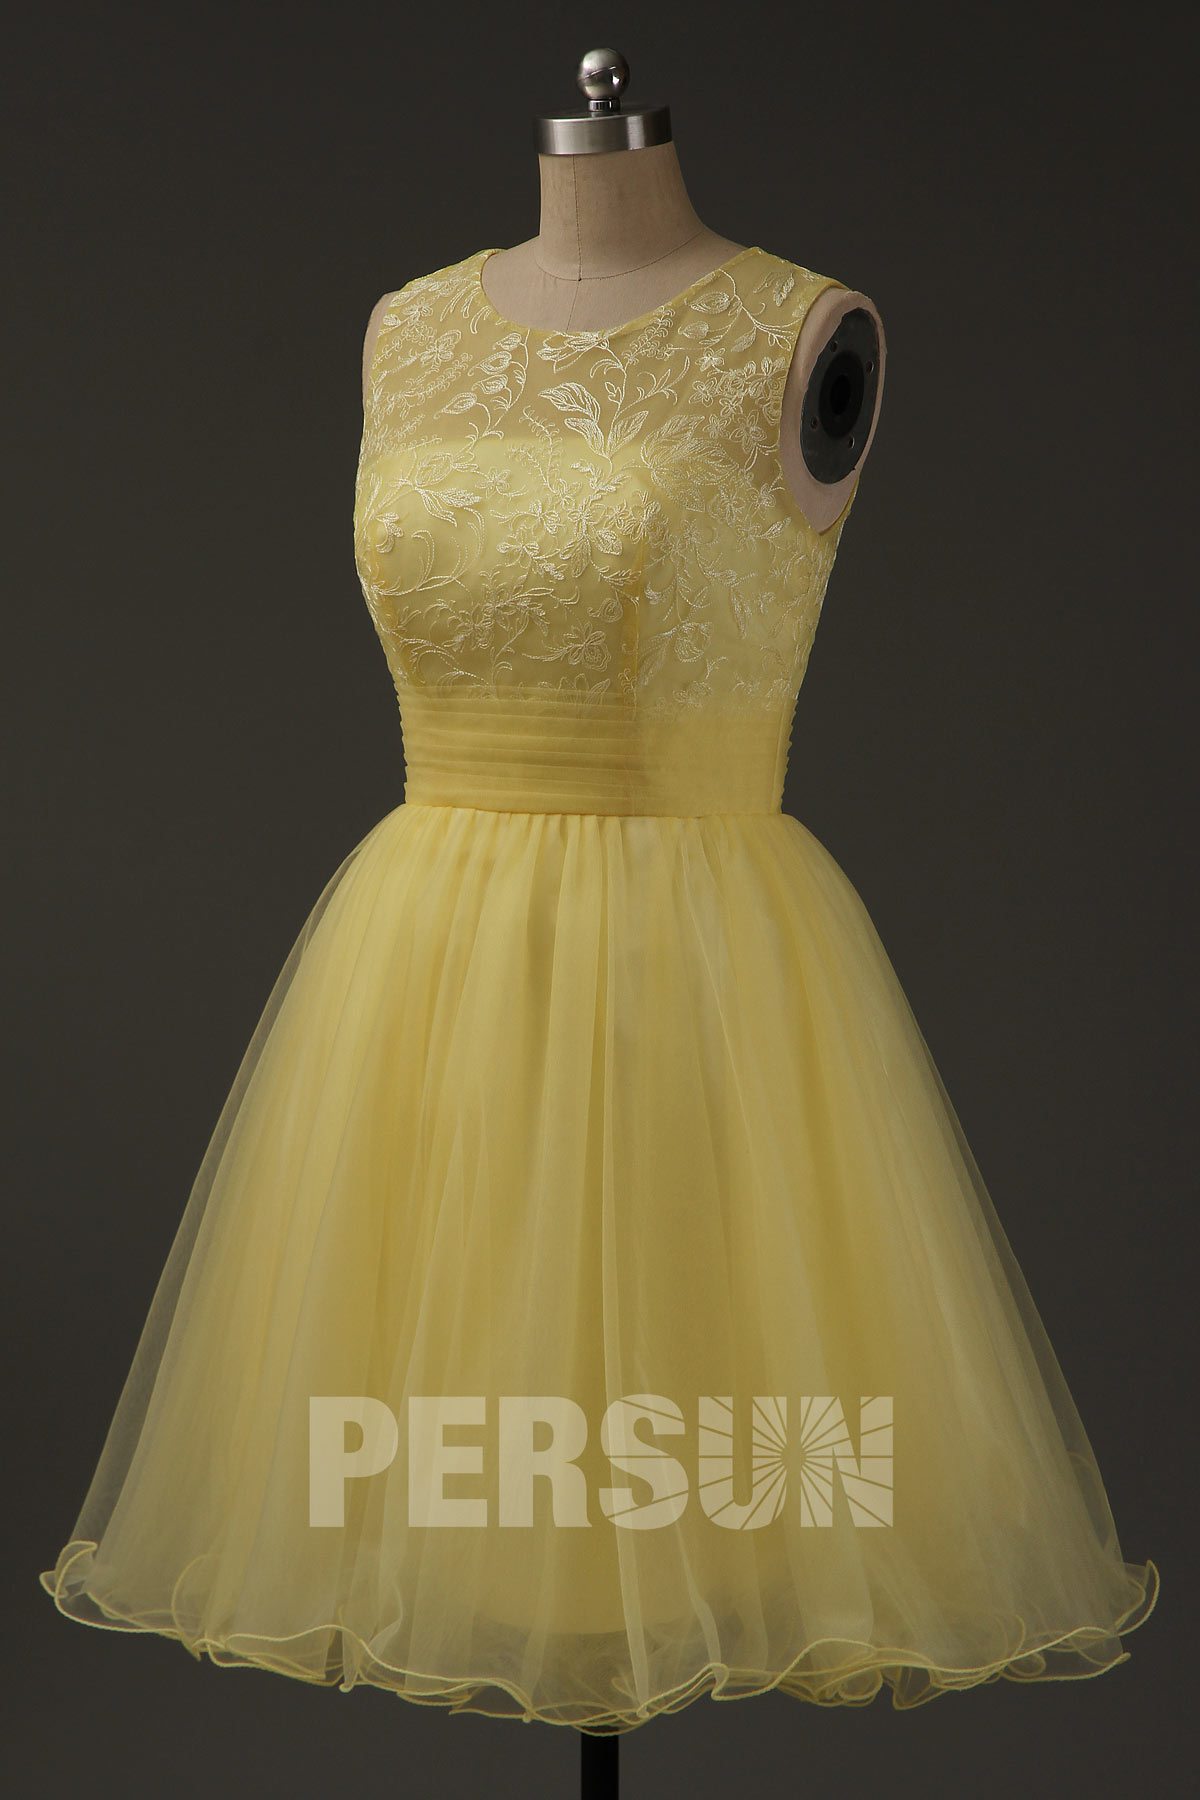 Robe cortège de mariage tutu jaune pale avec broderies